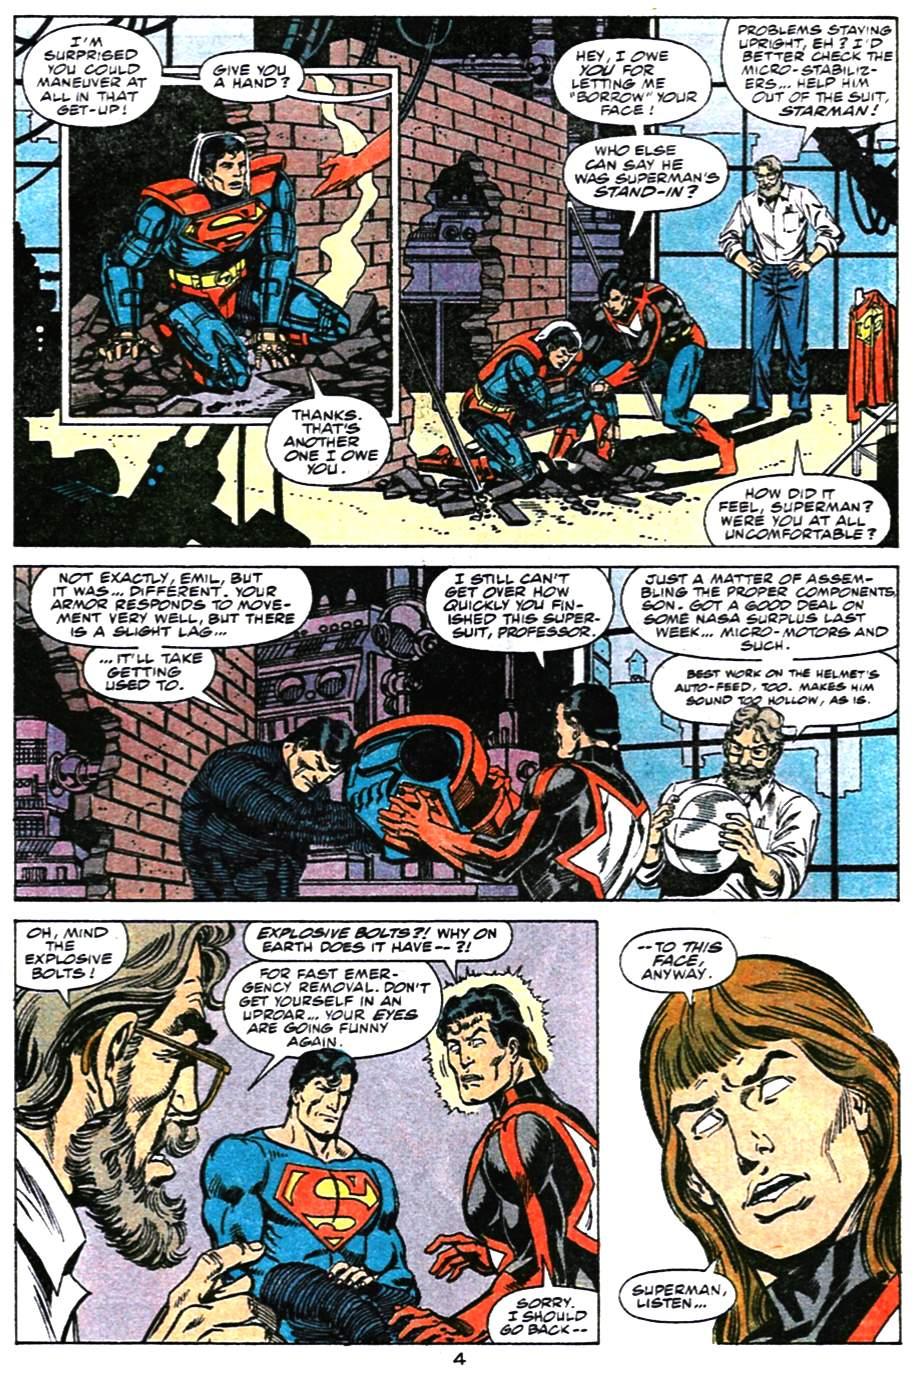 Action Comics (1938) 659 Page 4